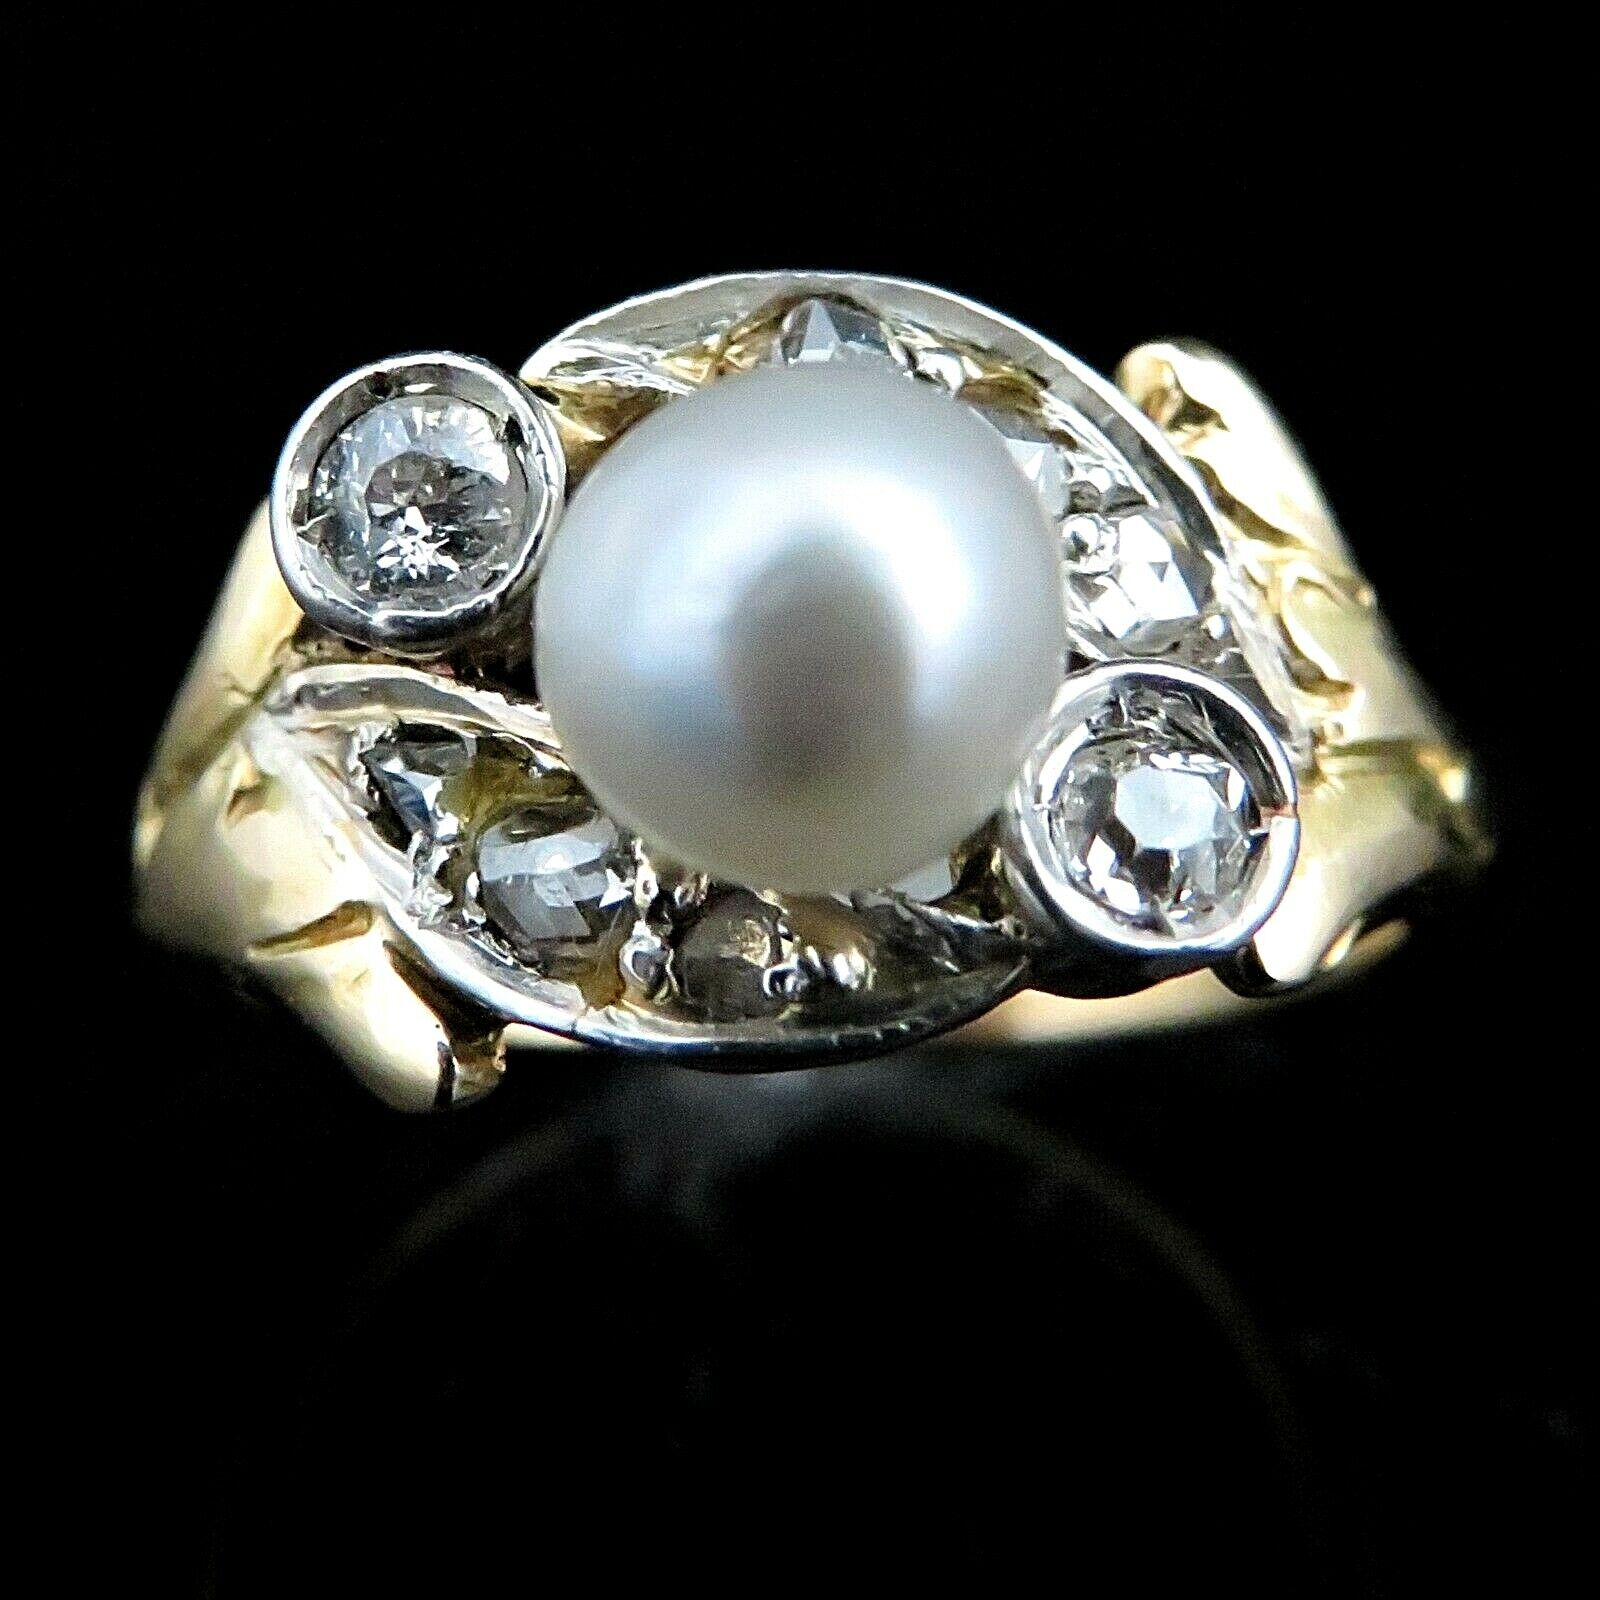 Antique Pearl Old European & pink Cut Diamond 18k Yellow gold Platinum Ring Gift